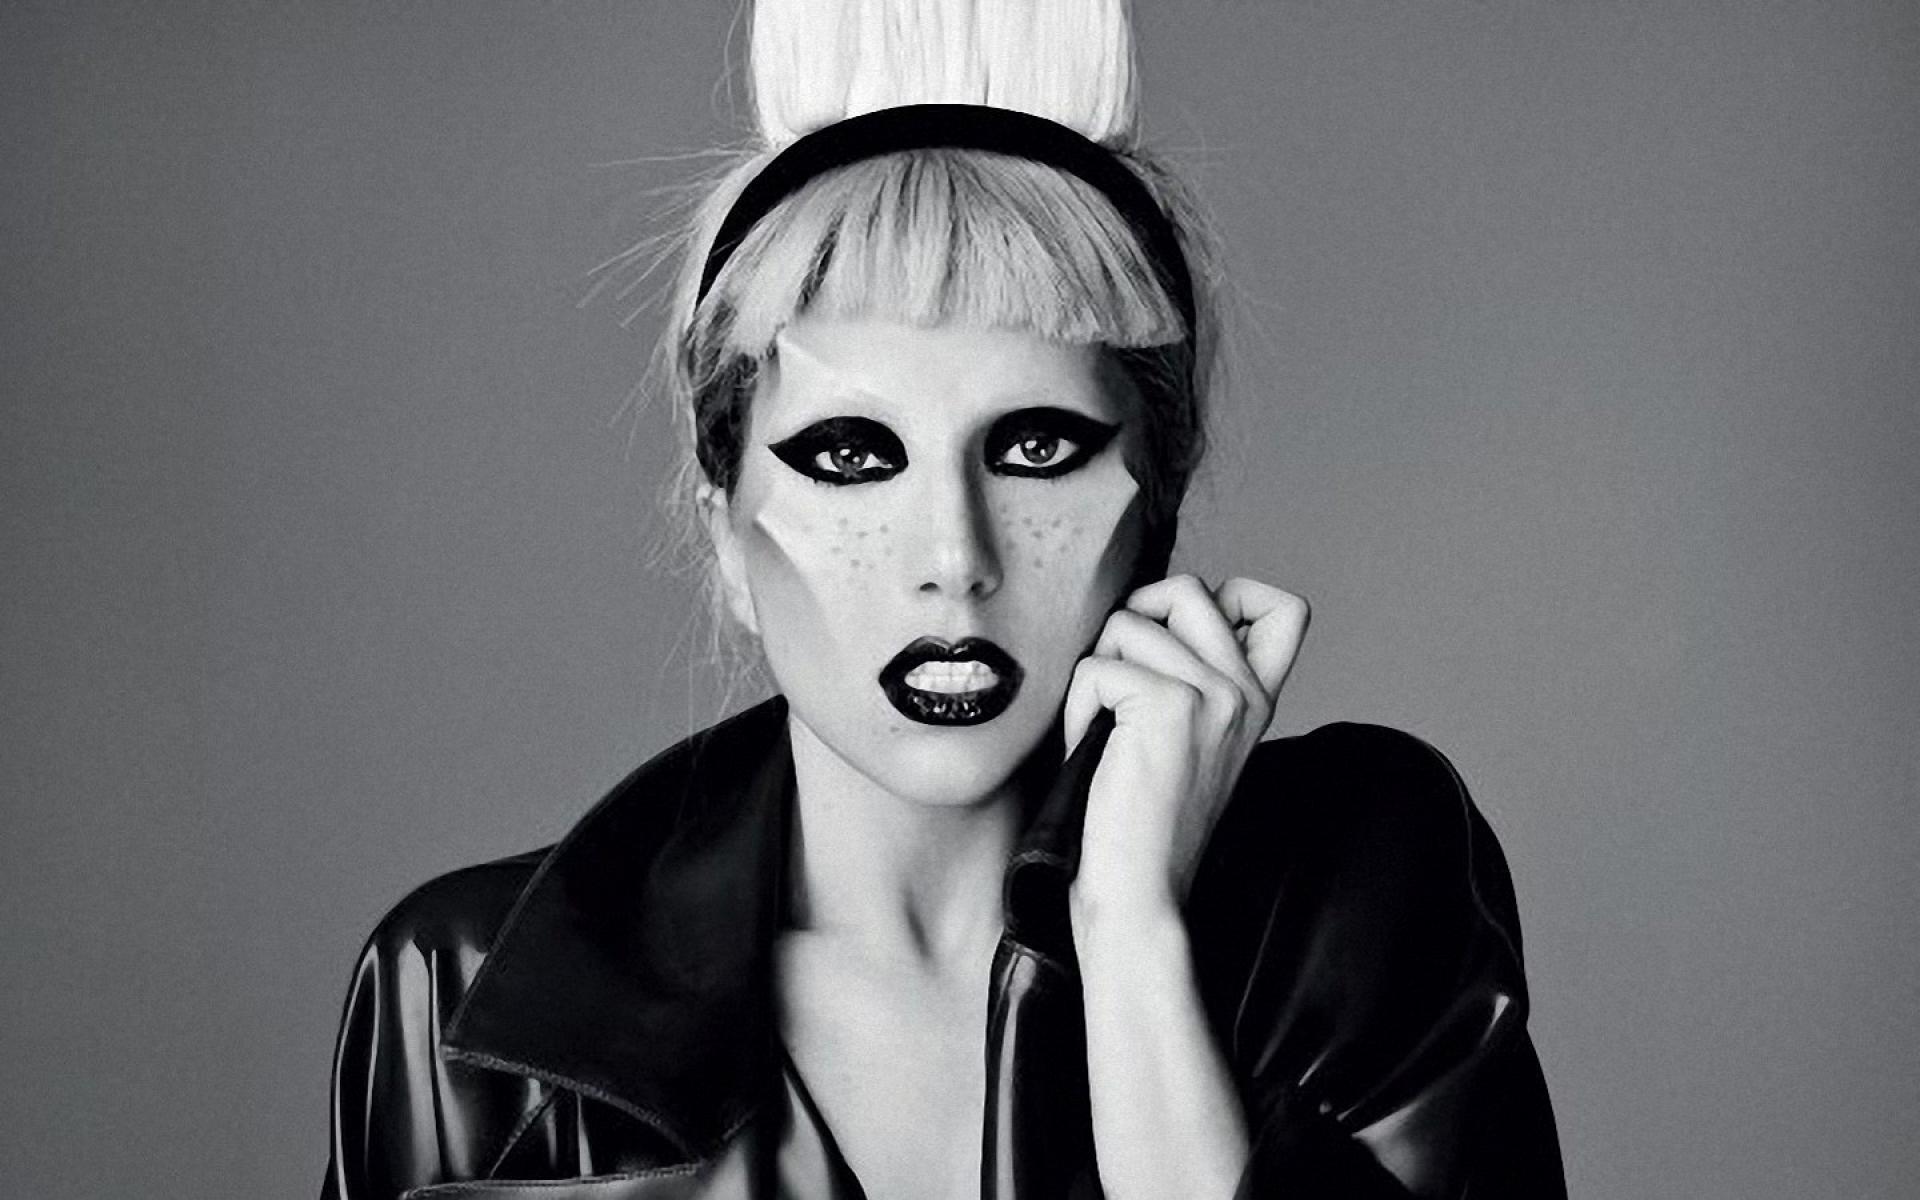 Lady Gaga Will Star in 'American Horror Story: Hotel' - Horror Film Central